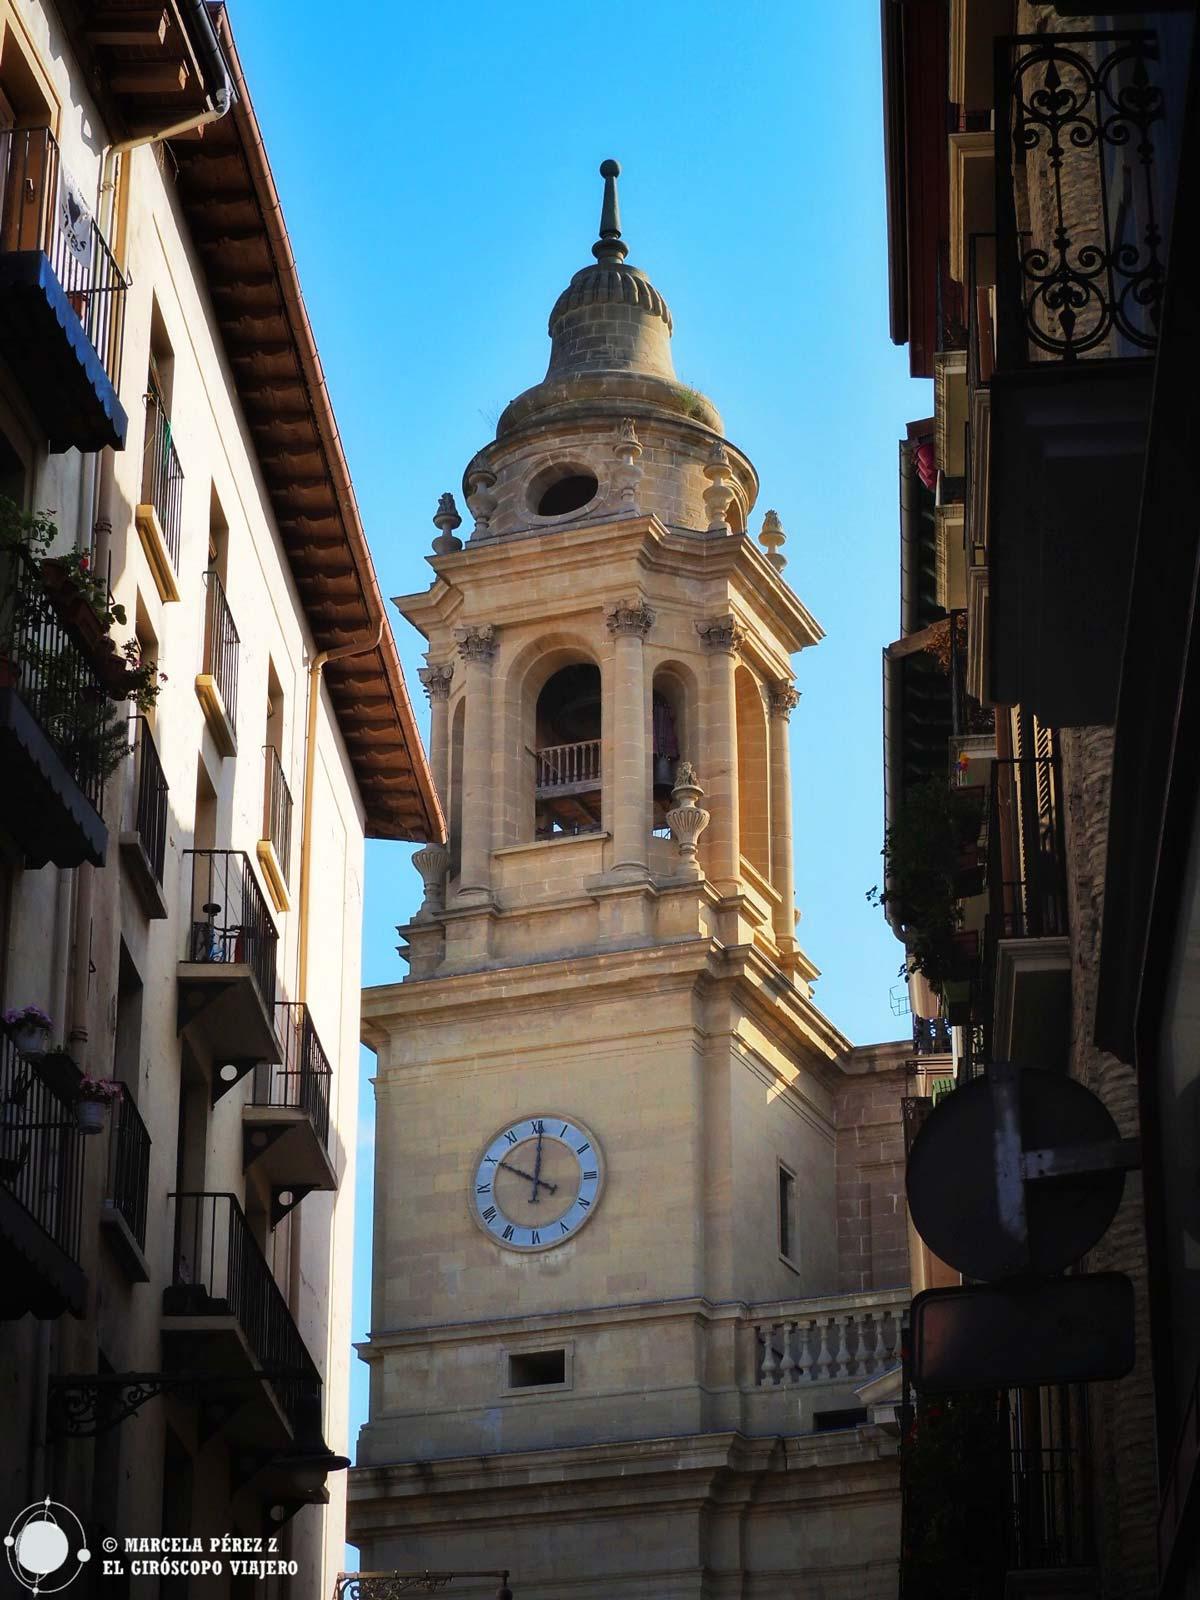 La catedral de Pamplona se asoma entre las calles